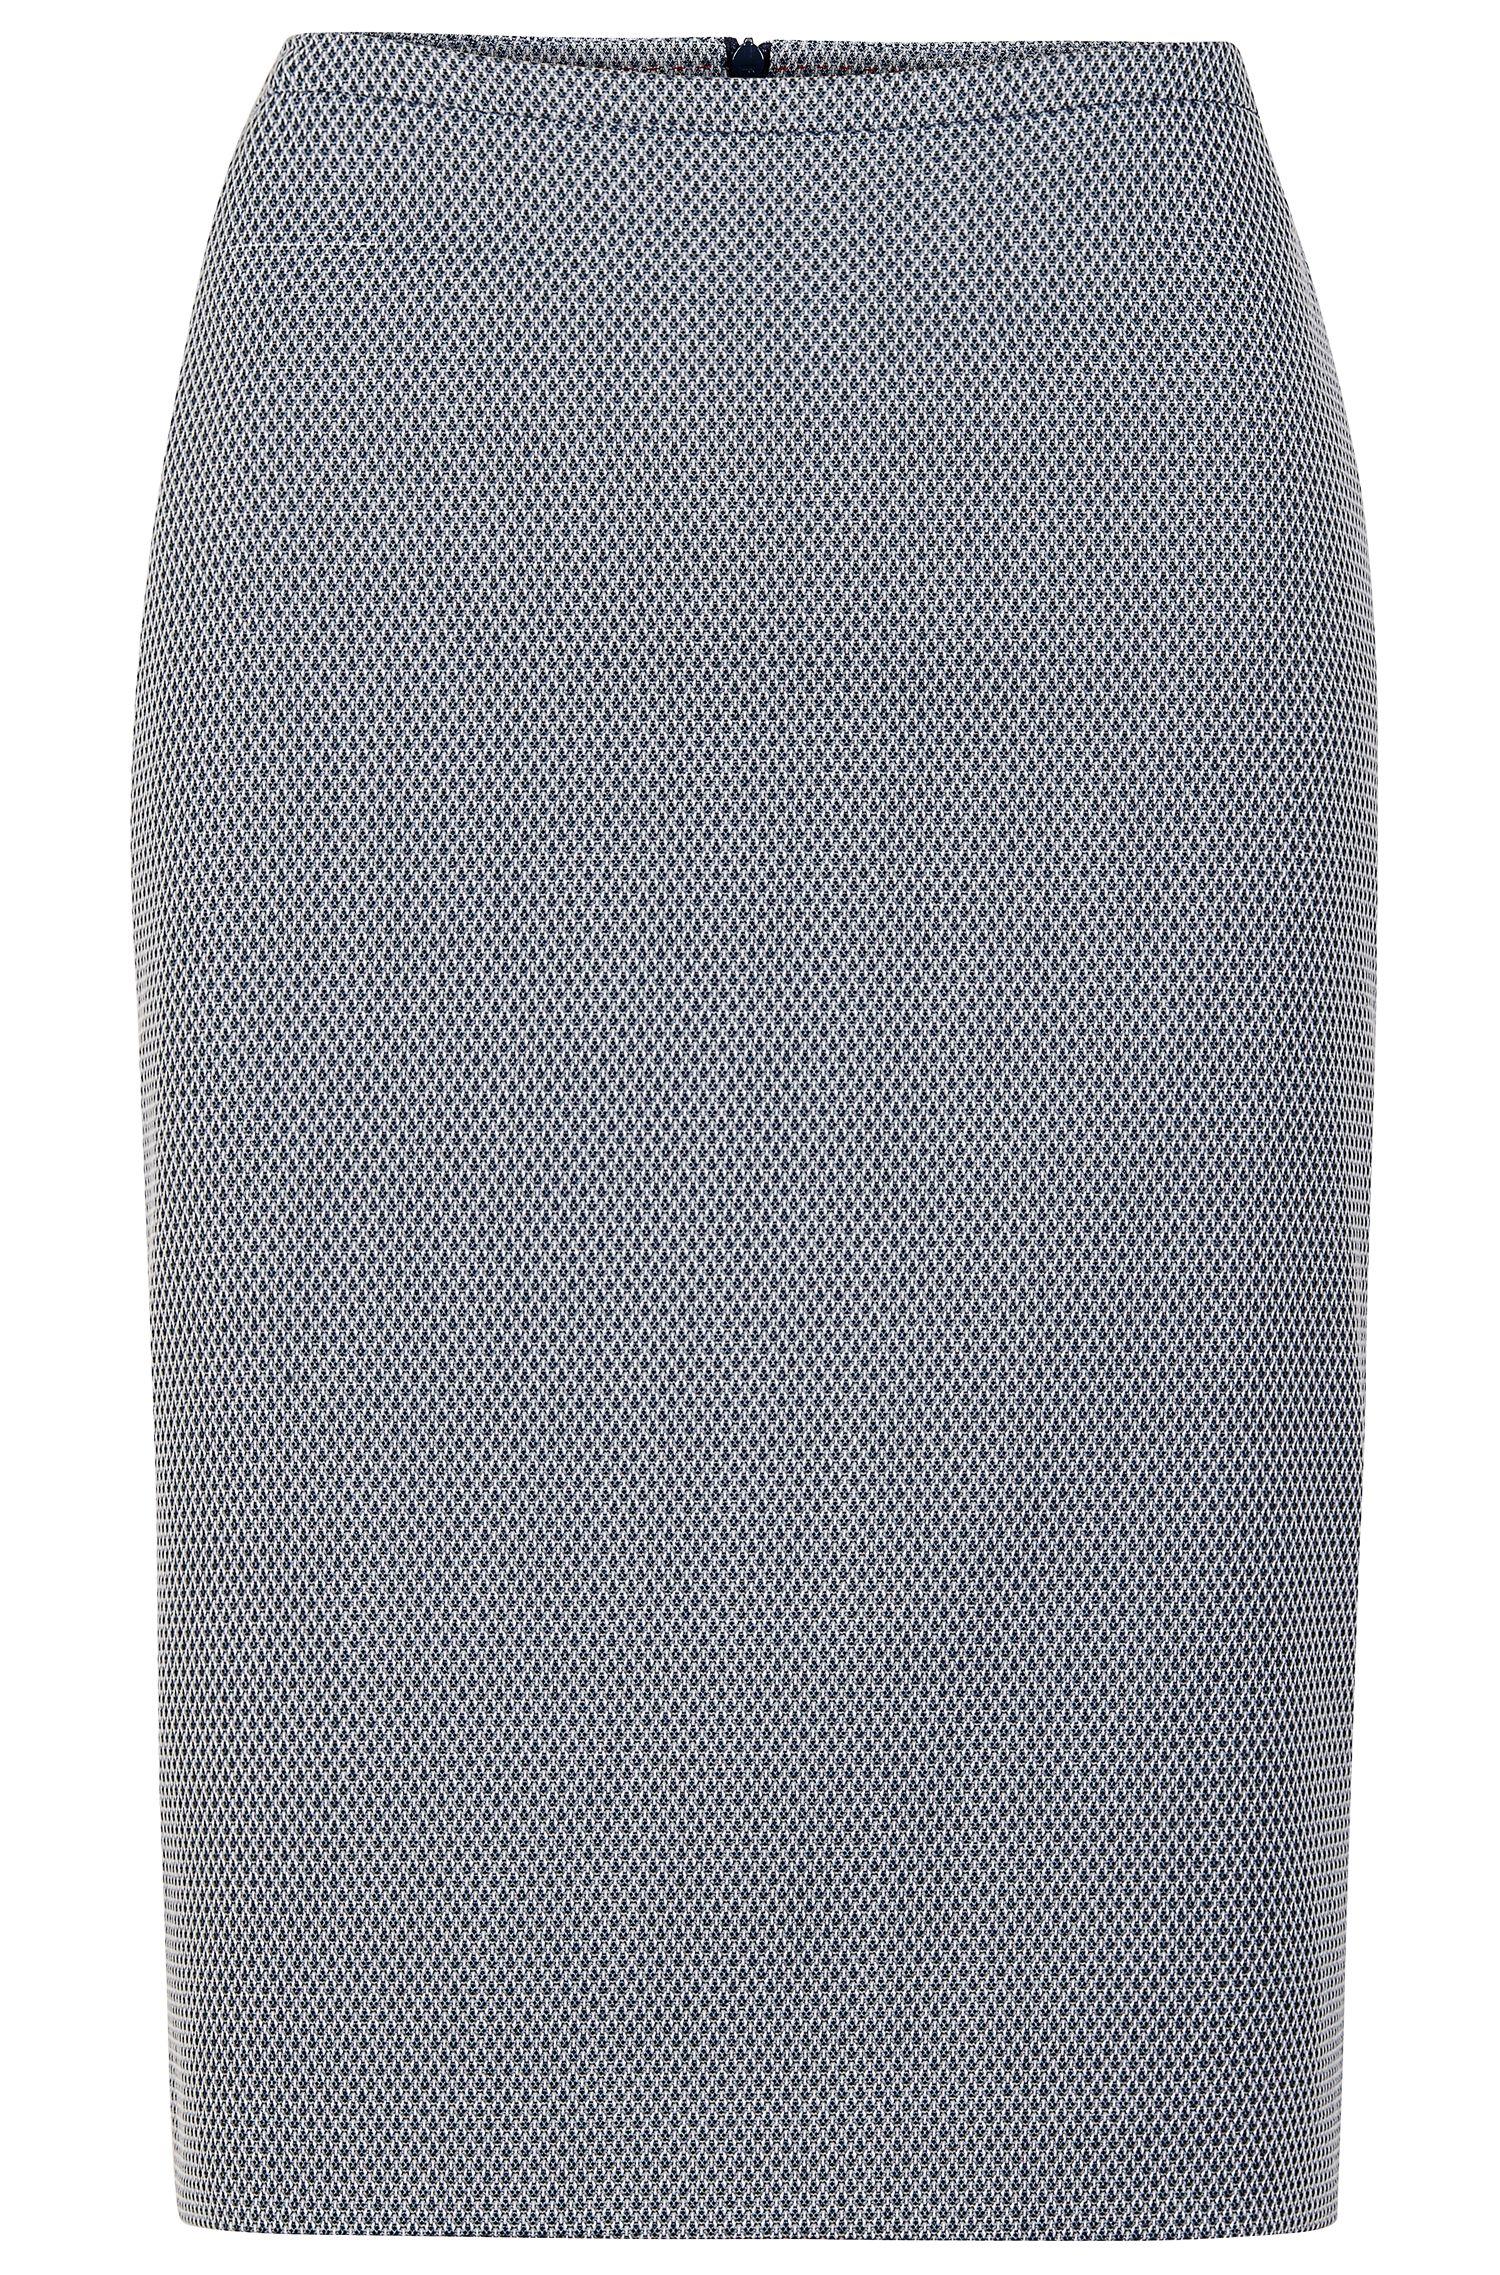 'Ranina'   Stretch Cotton Blend Pencil Skirt